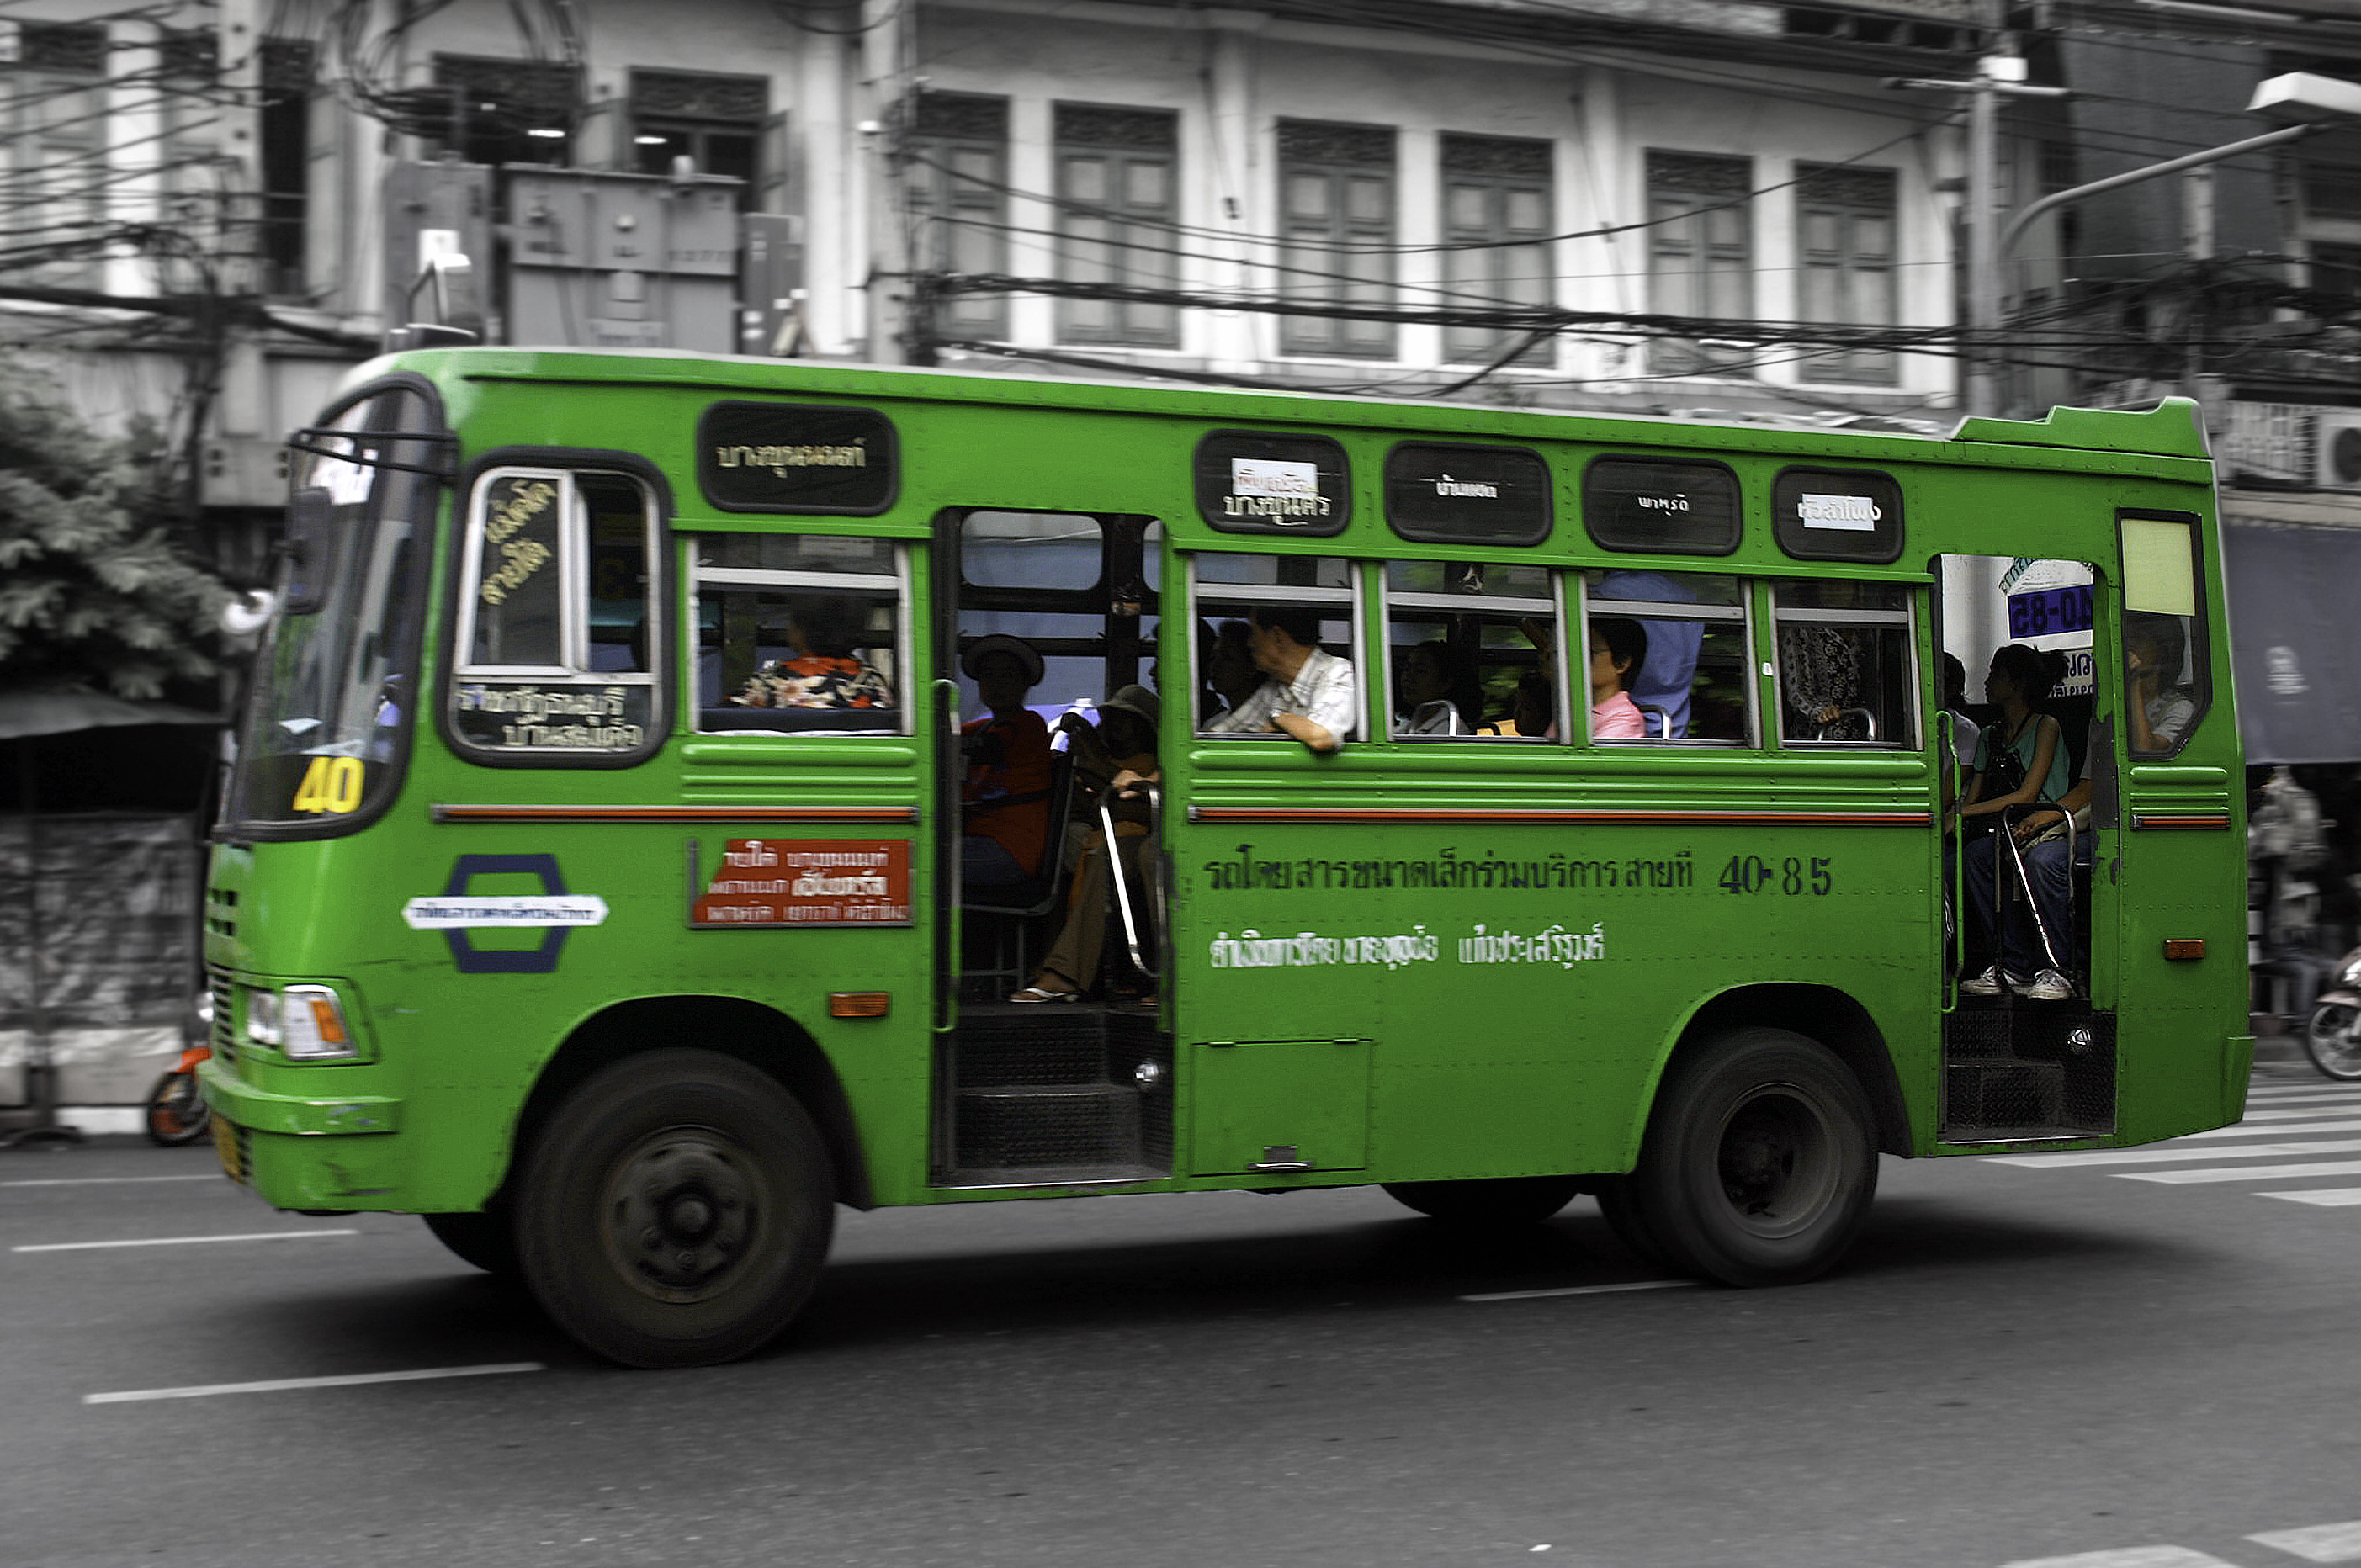 Transports In Bangkok By Photographer C U00e9cile Lopes